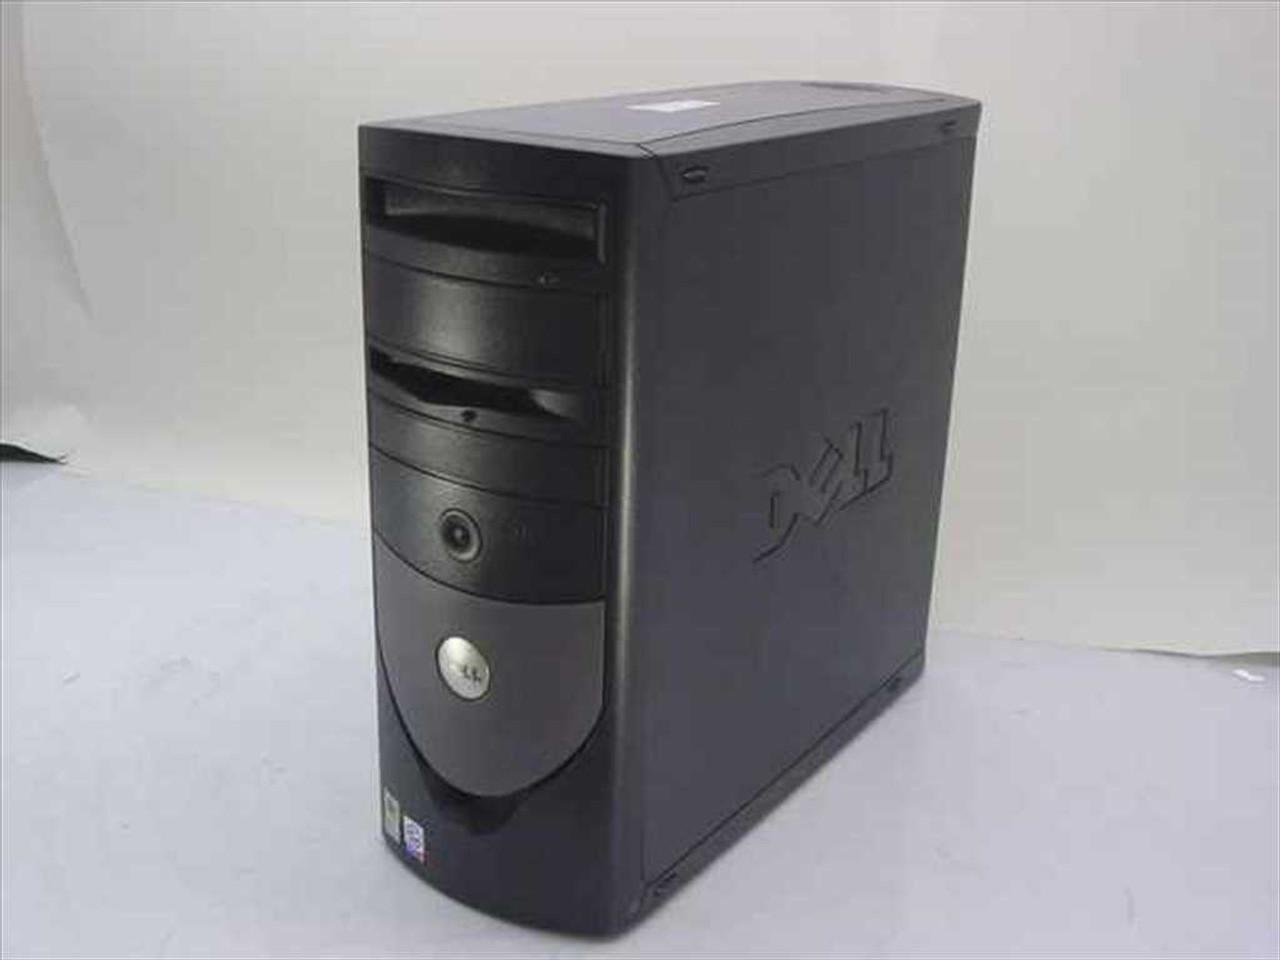 dell intel p4 2 0ghz 512mb ram 40gb hdd recycledgoods com rh recycledgoods com Dell Optiplex GX240 Dell Optiplex GX270